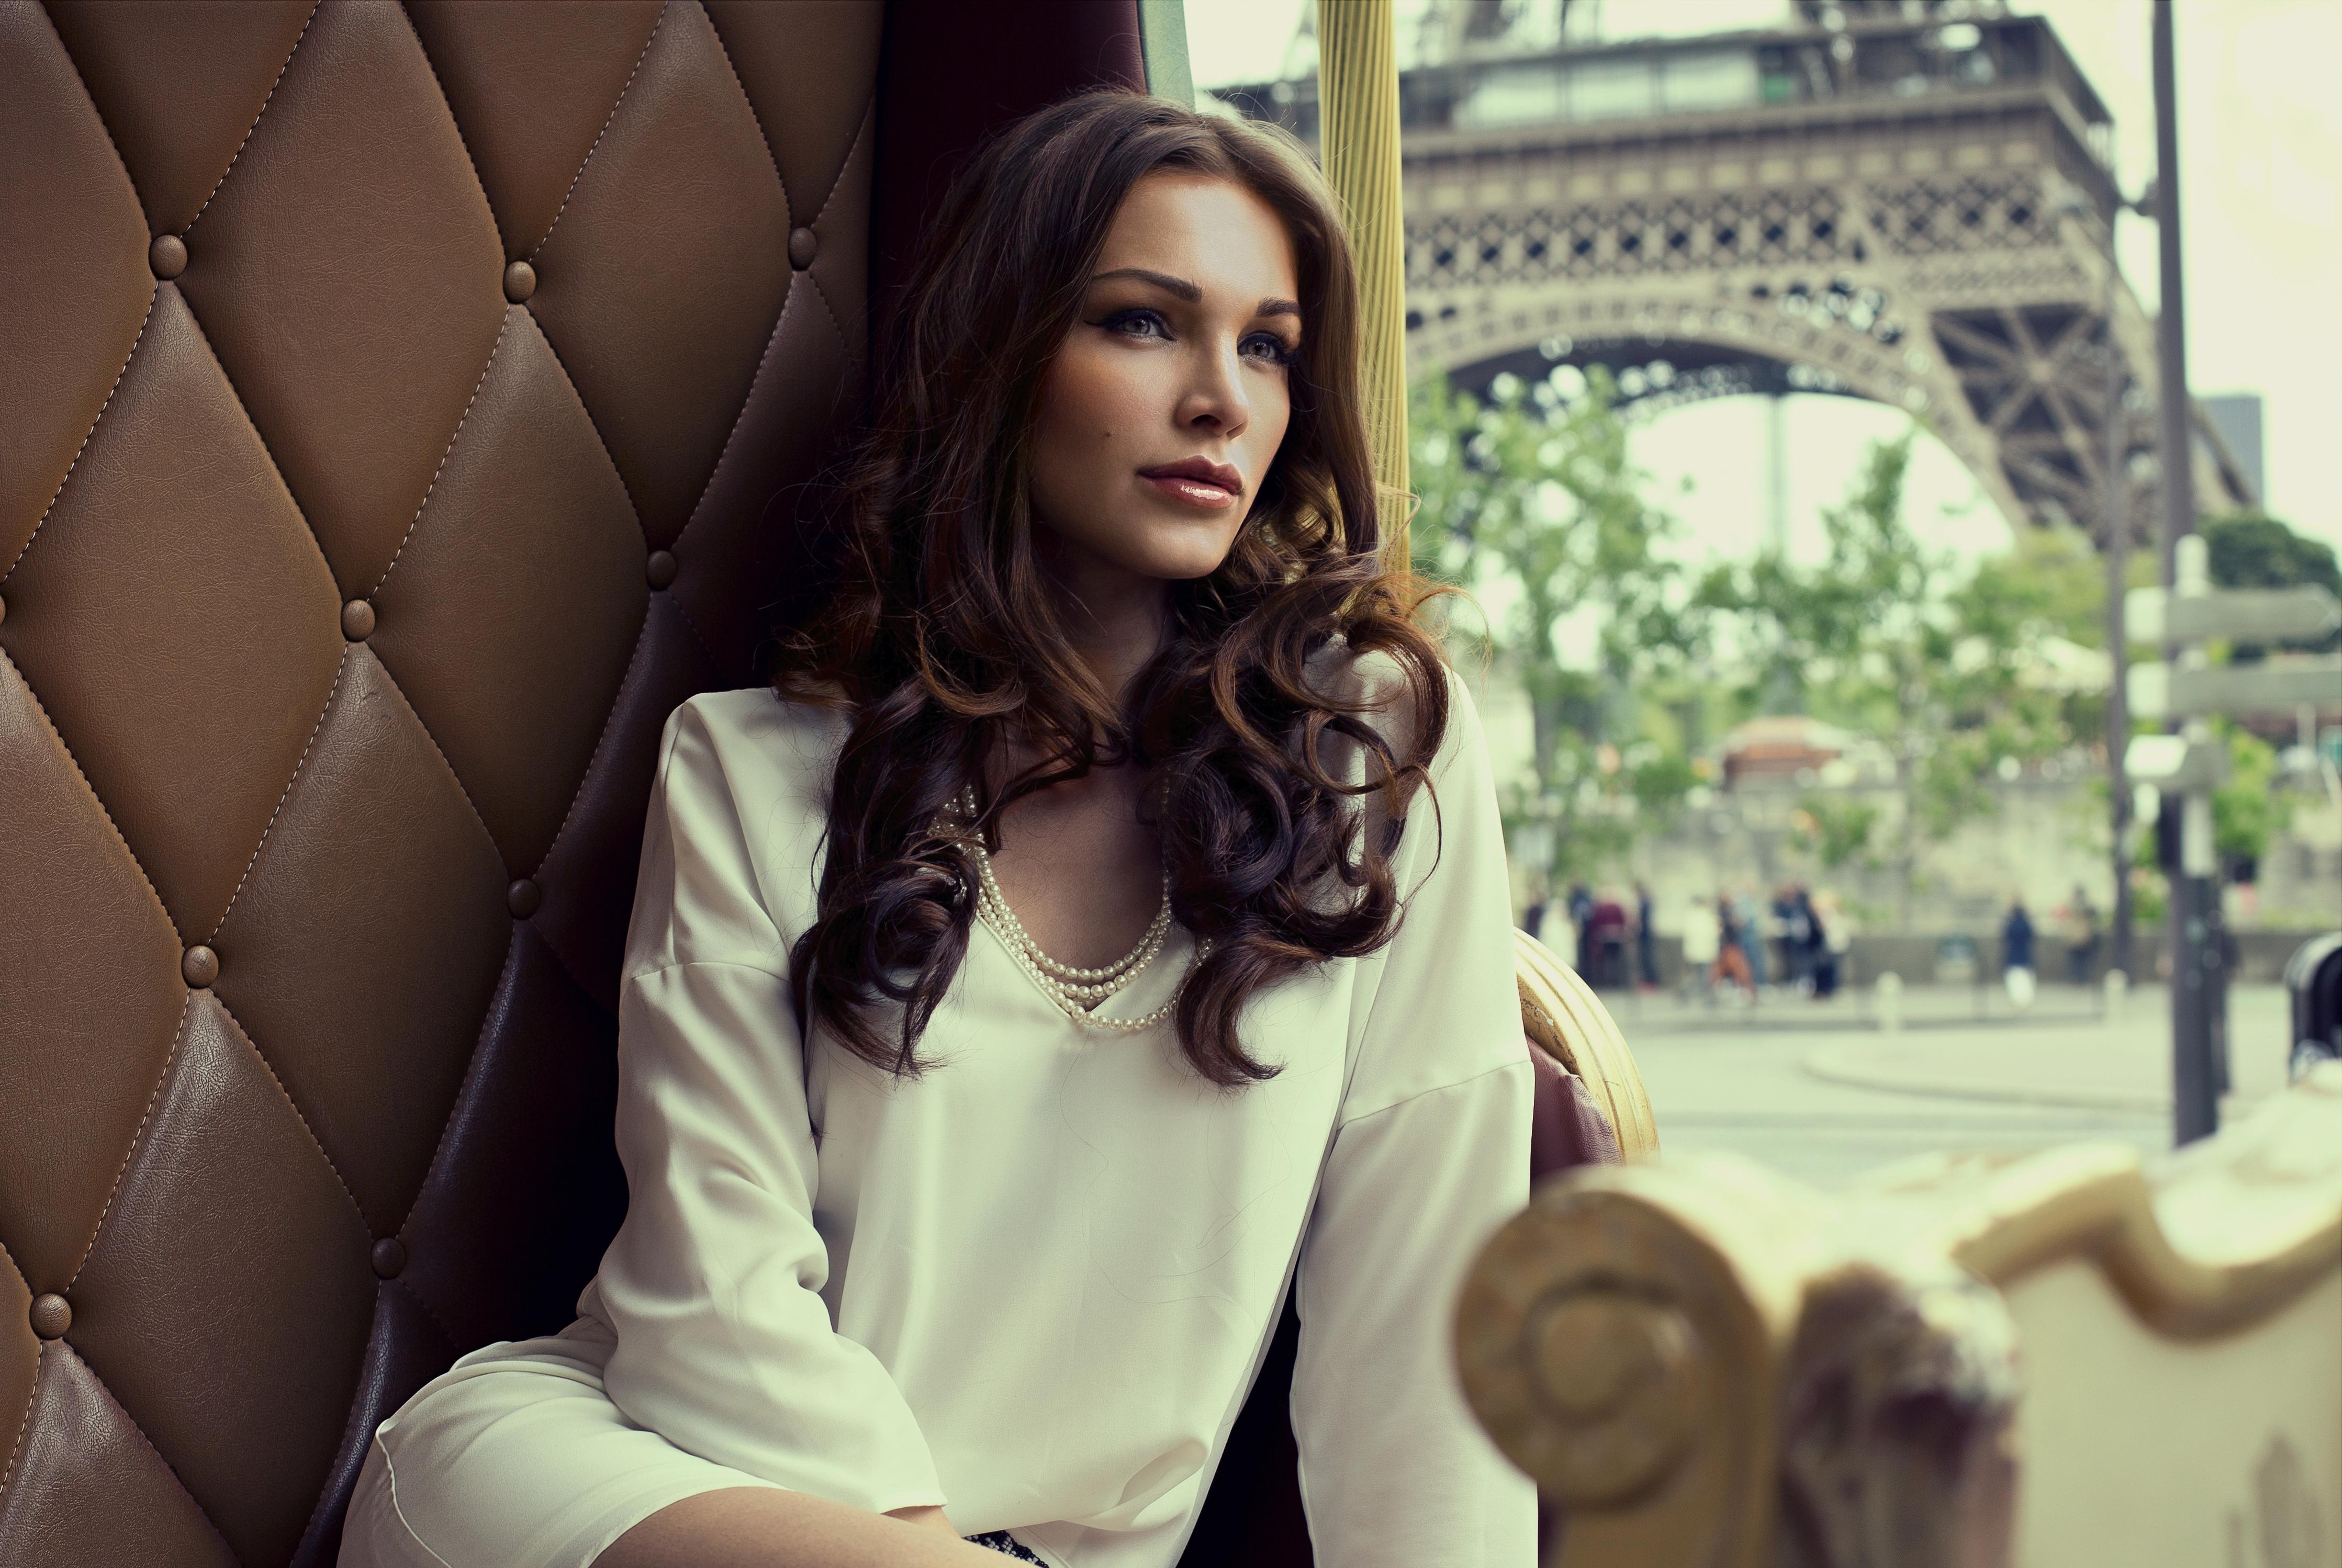 Француженки девушки фото 7 фотография